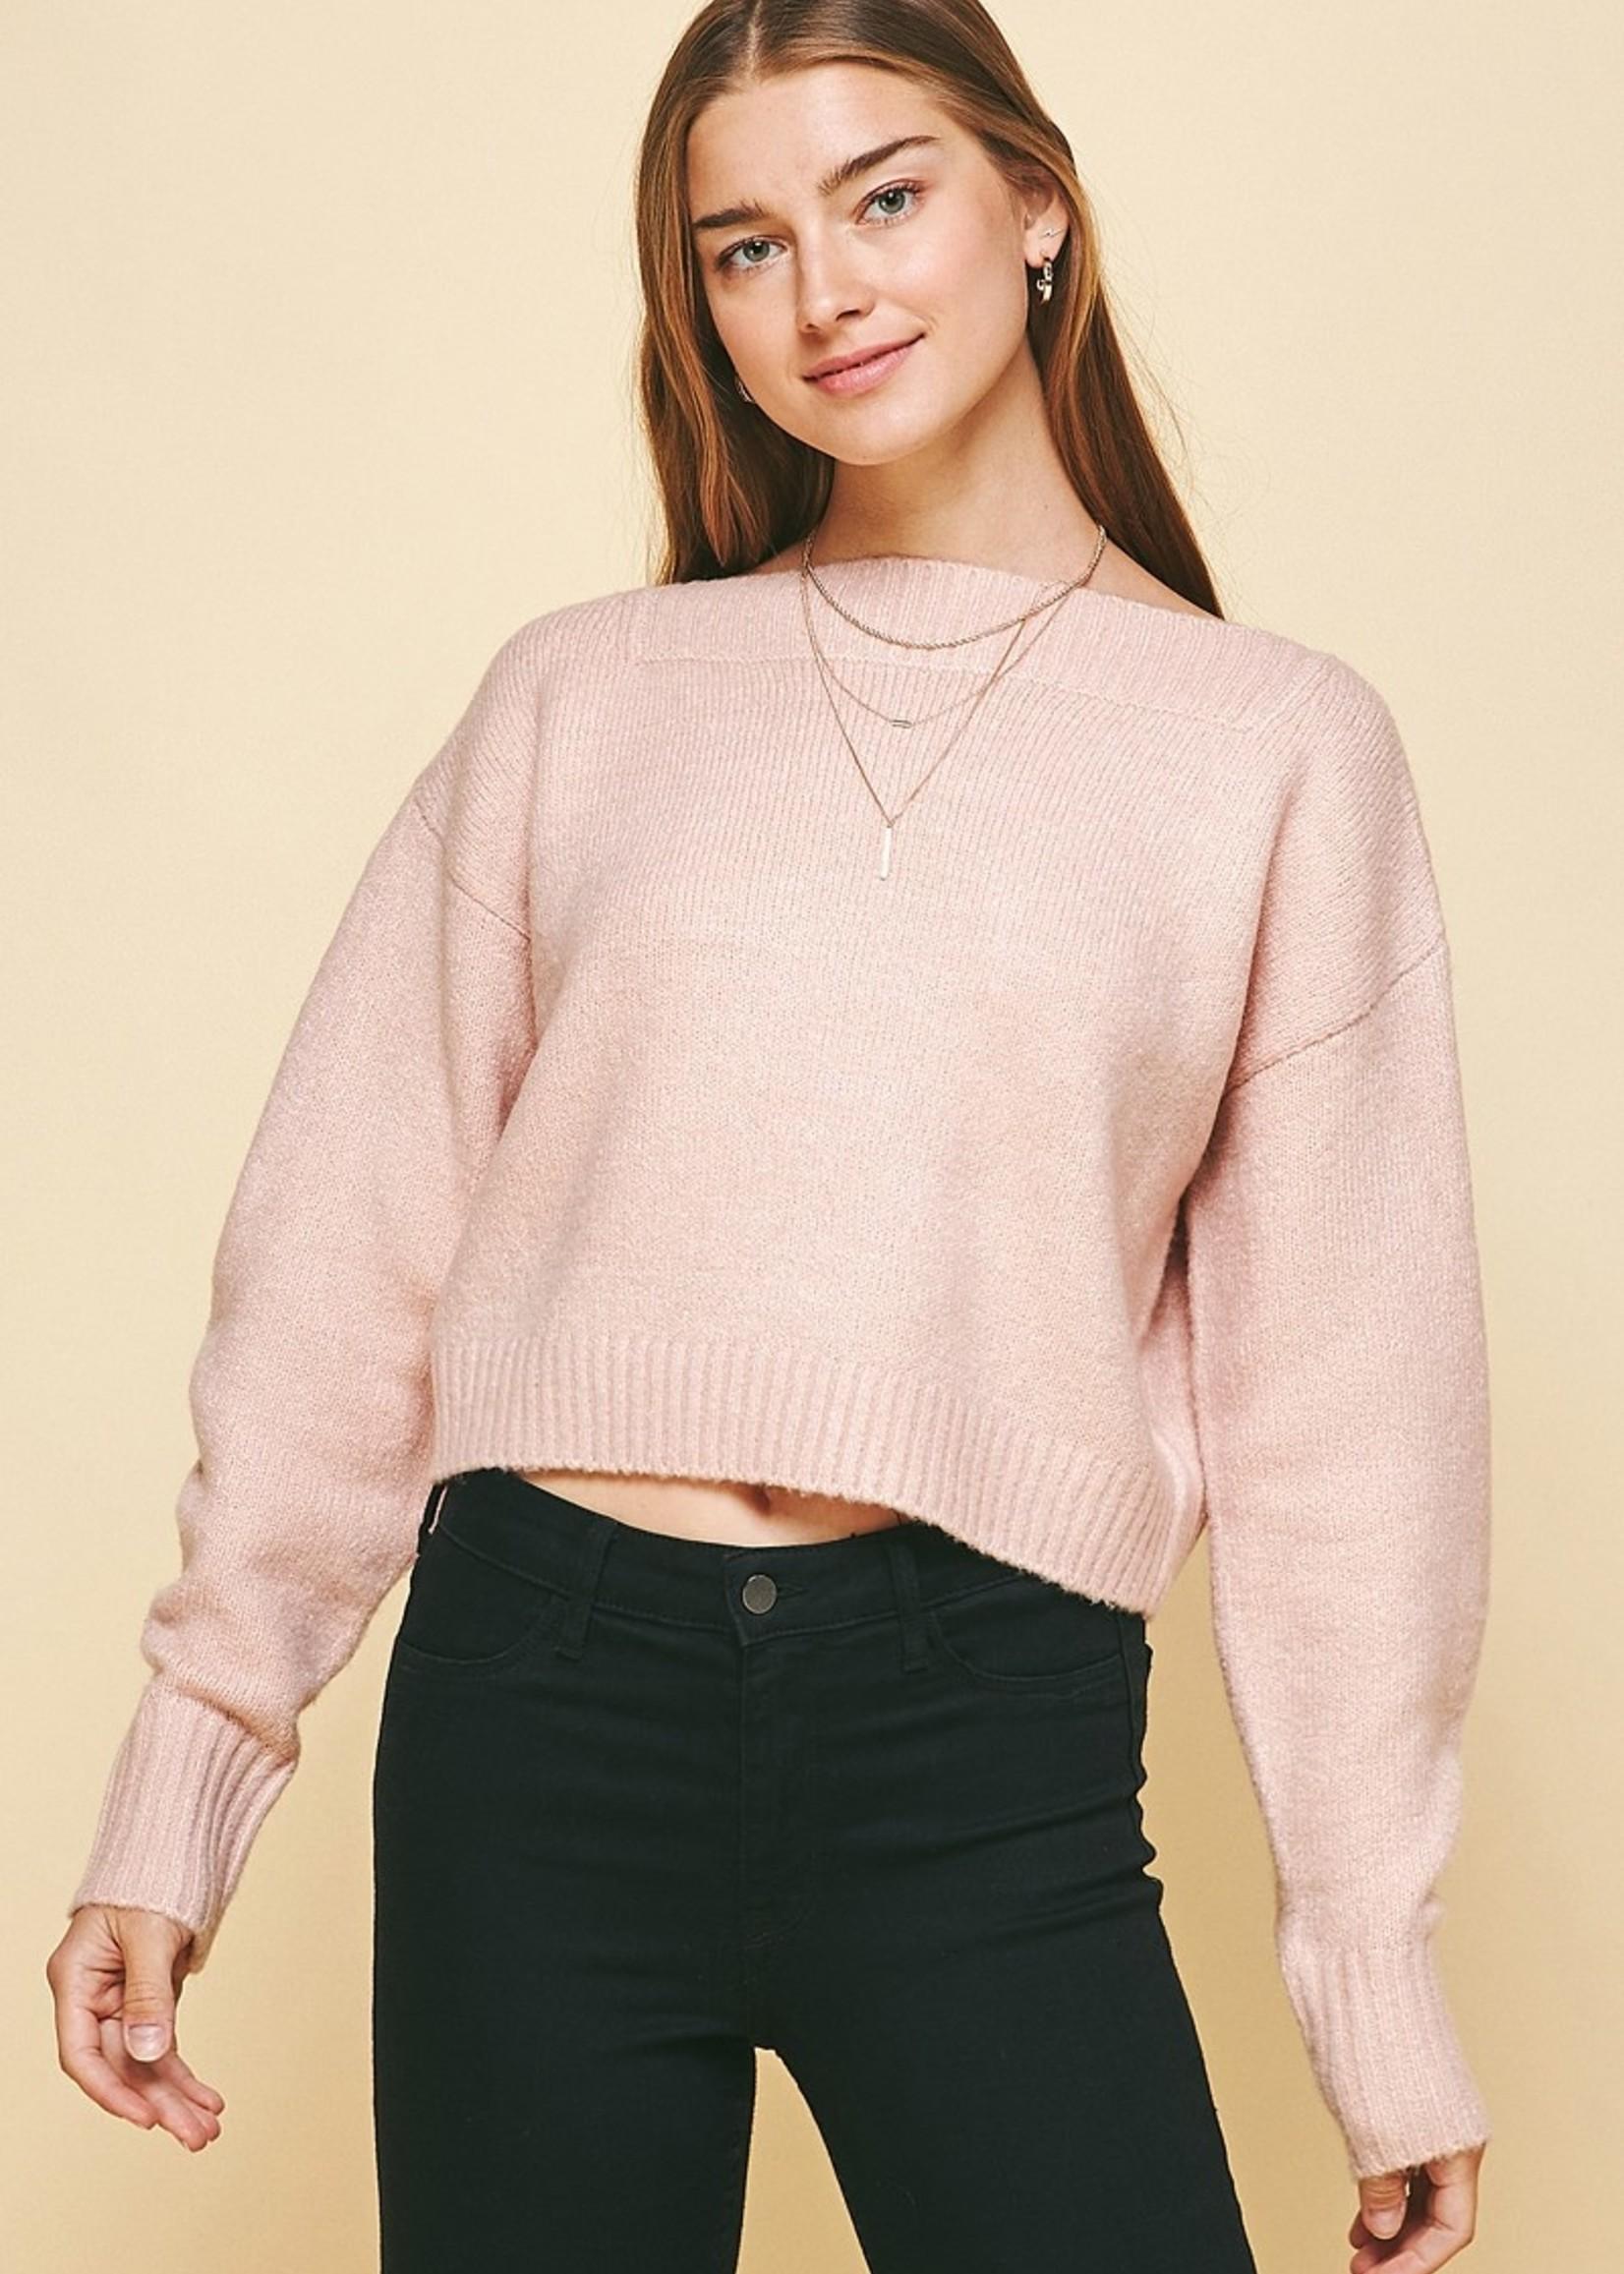 Boatneck Soft Sweater - Pink